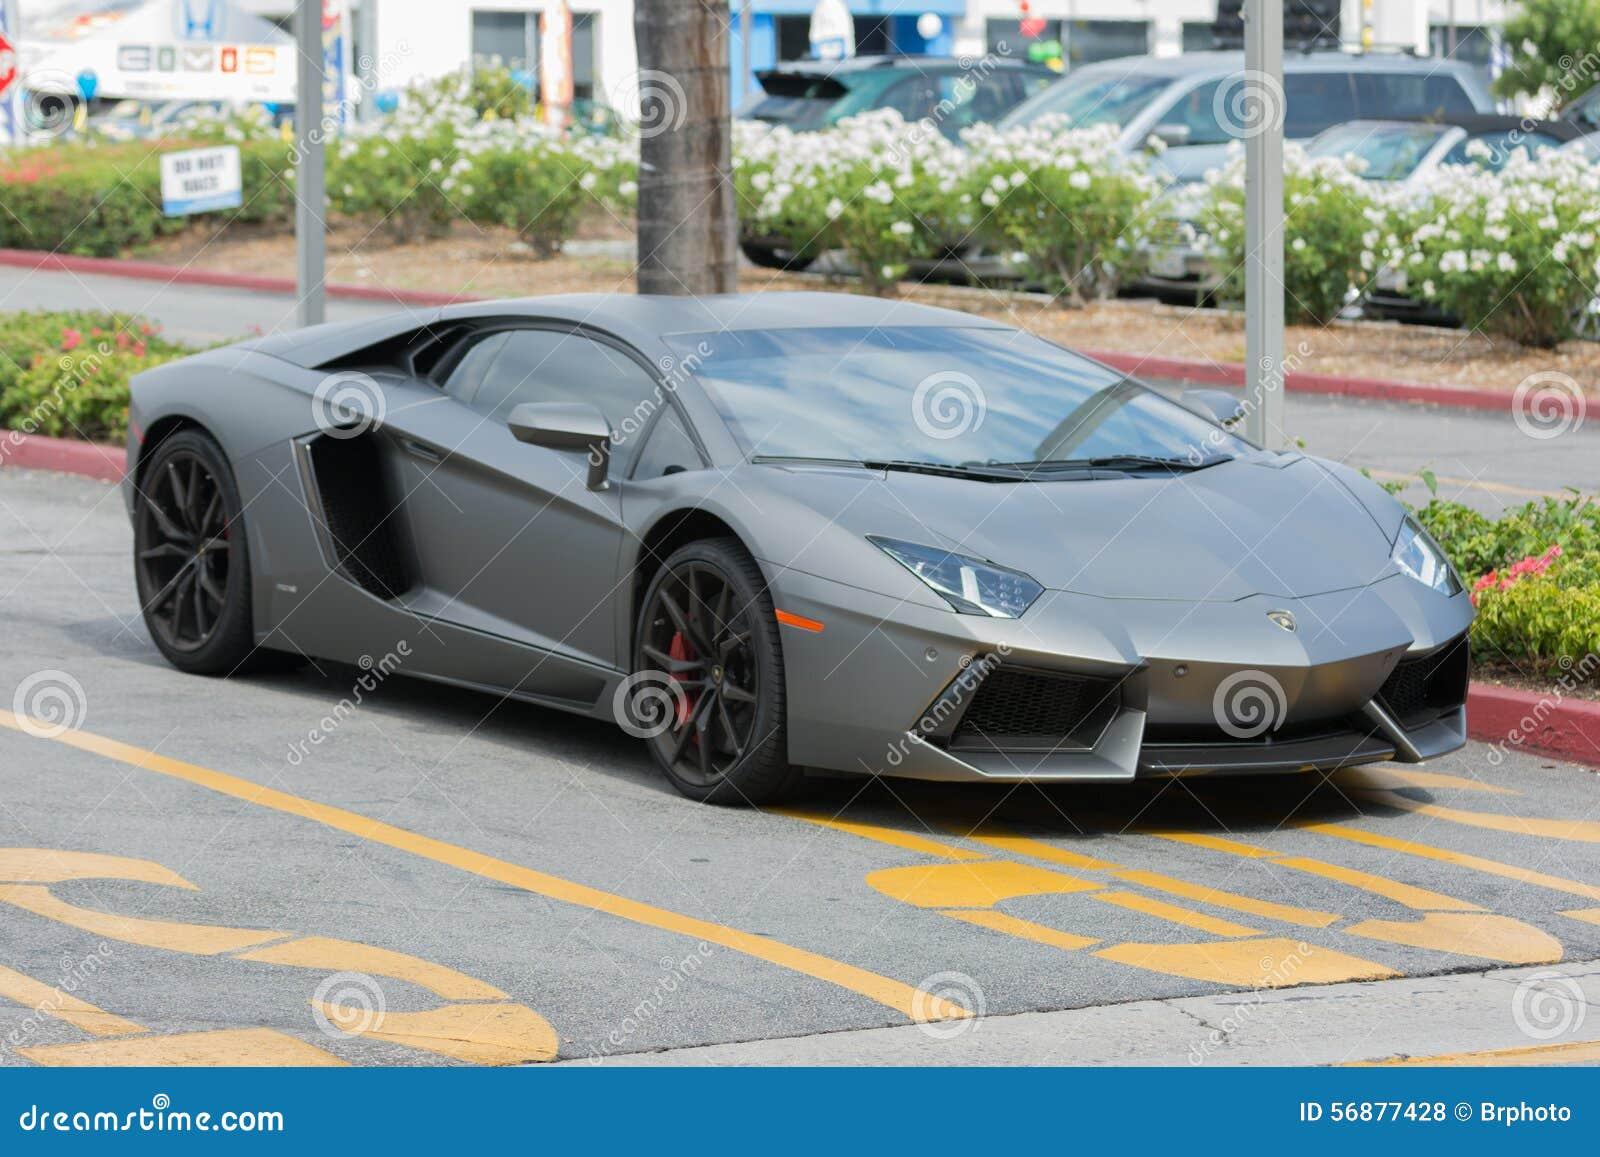 Lamborghini Aventador samochód na pokazie